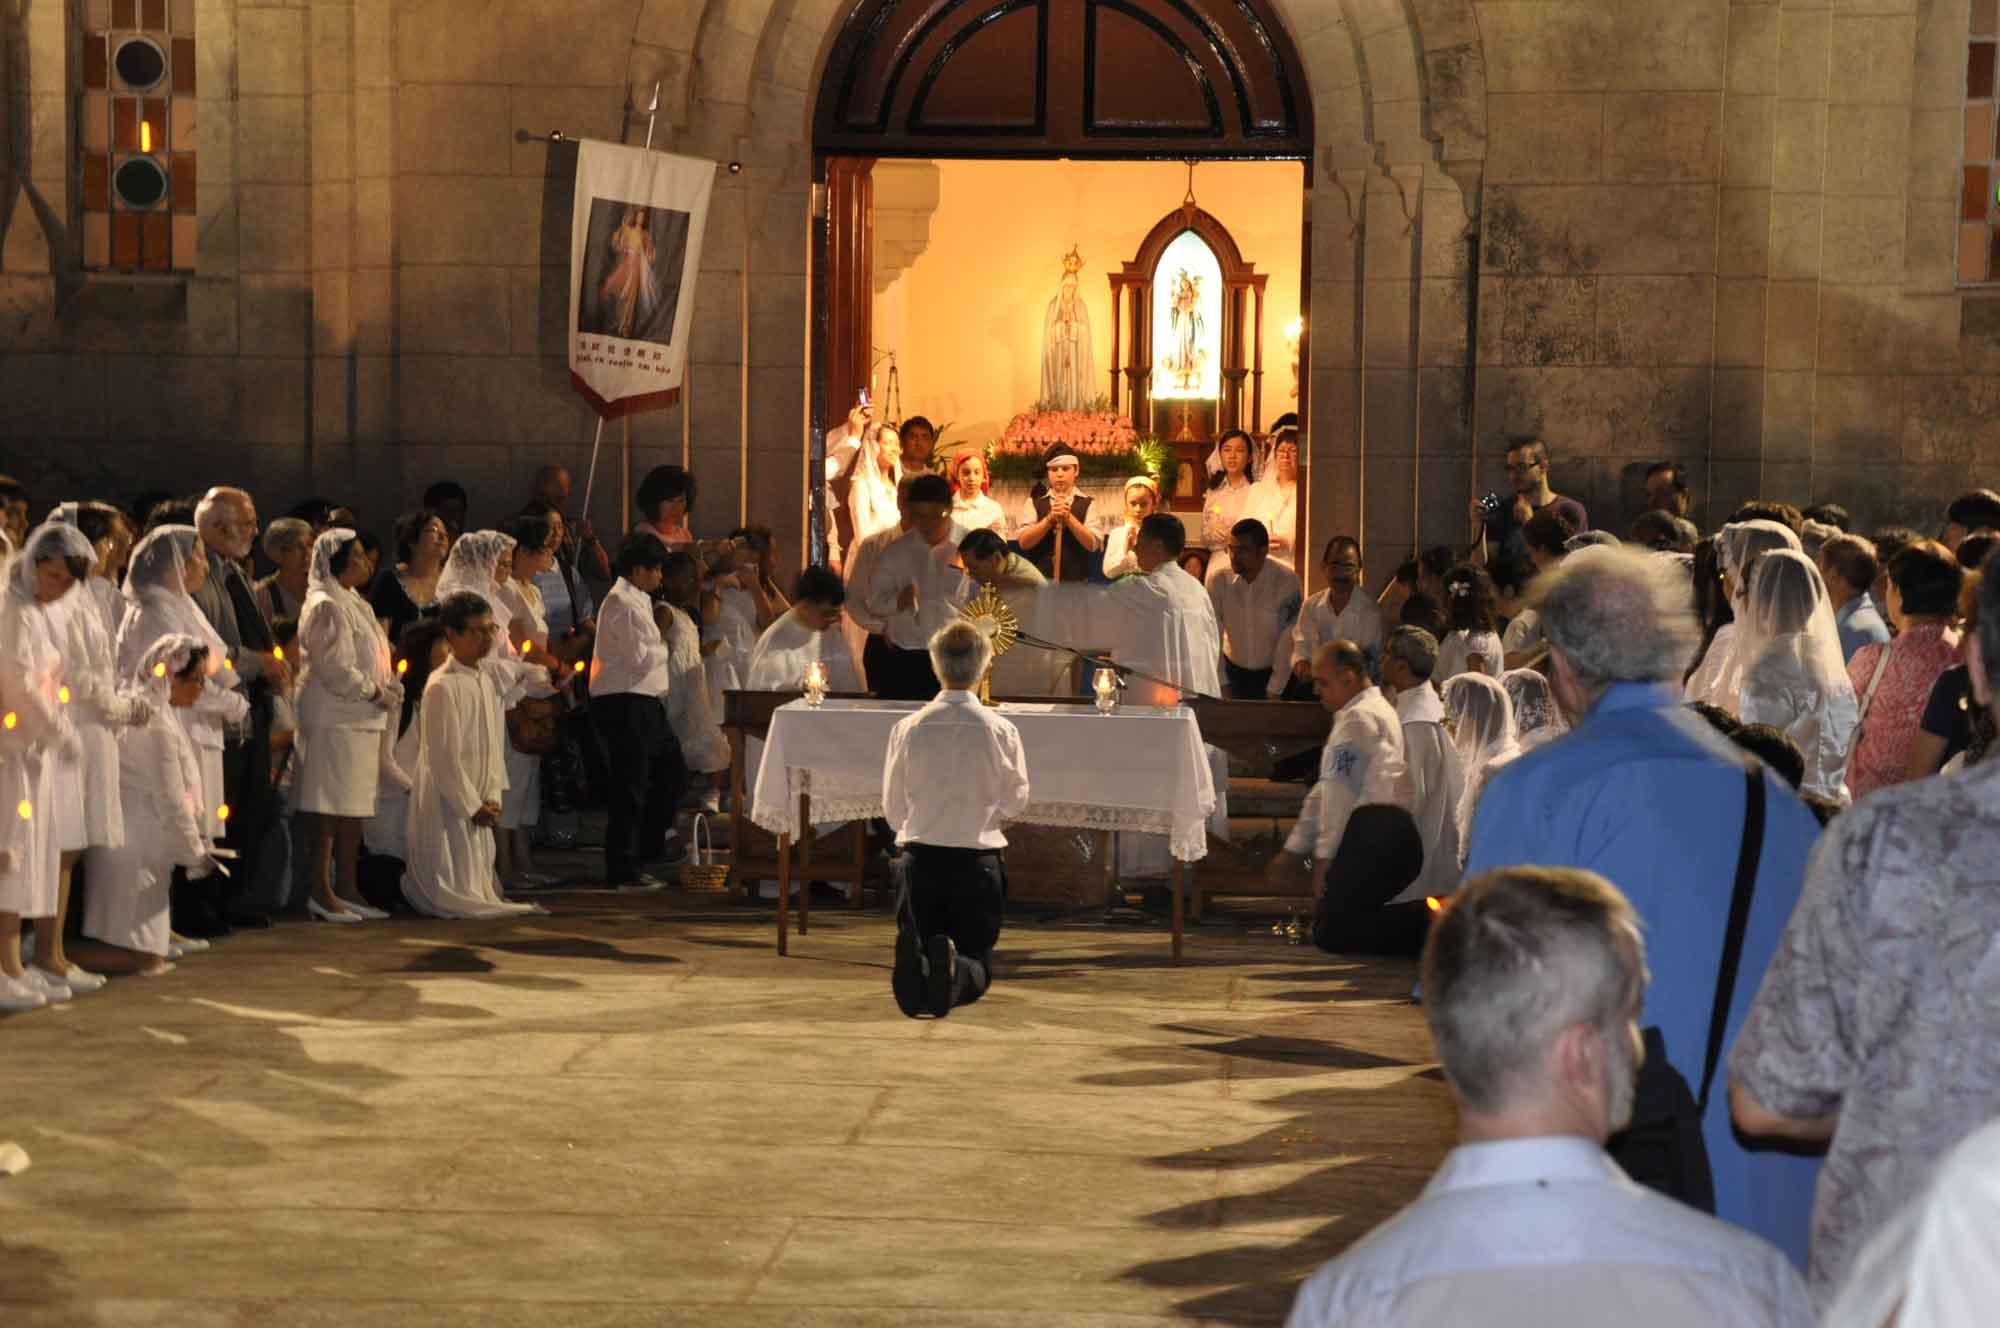 Macau's Our Lady of Fatima Procession service at Penha Church